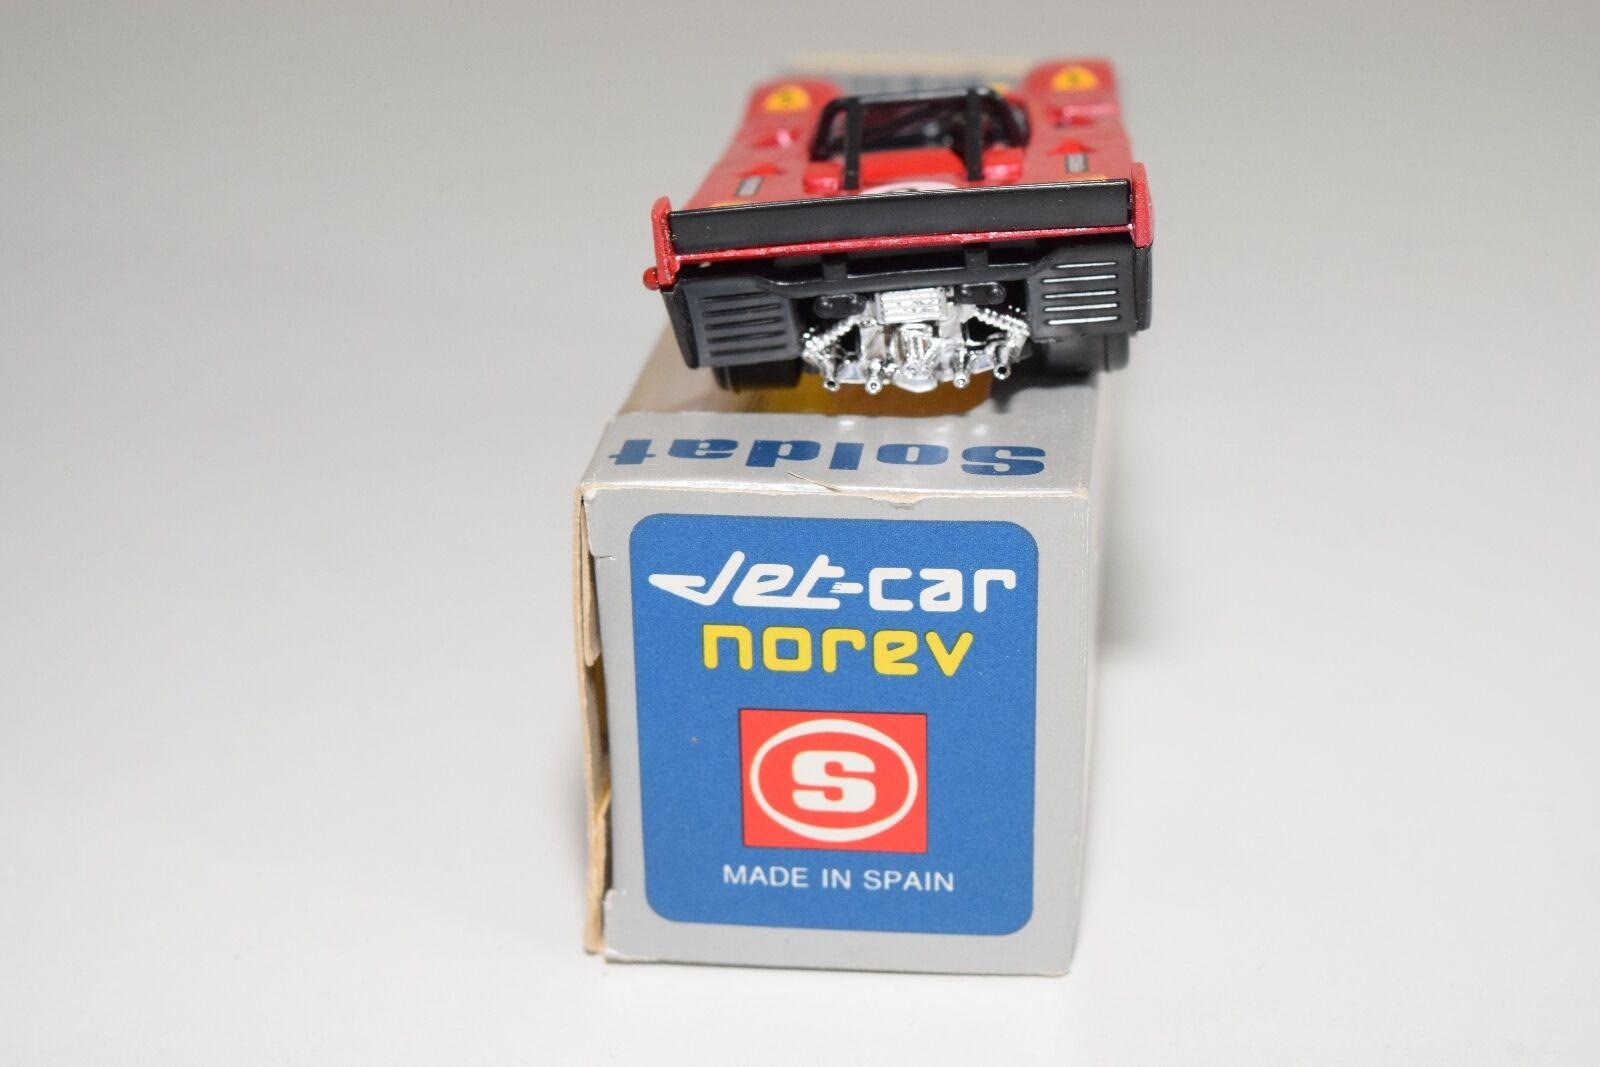 + NOREV JET-CAR SOLDAT SPANISH BOX 835 FERRARI FERRARI FERRARI 008   312 P MINT BOXED RARE 103efd